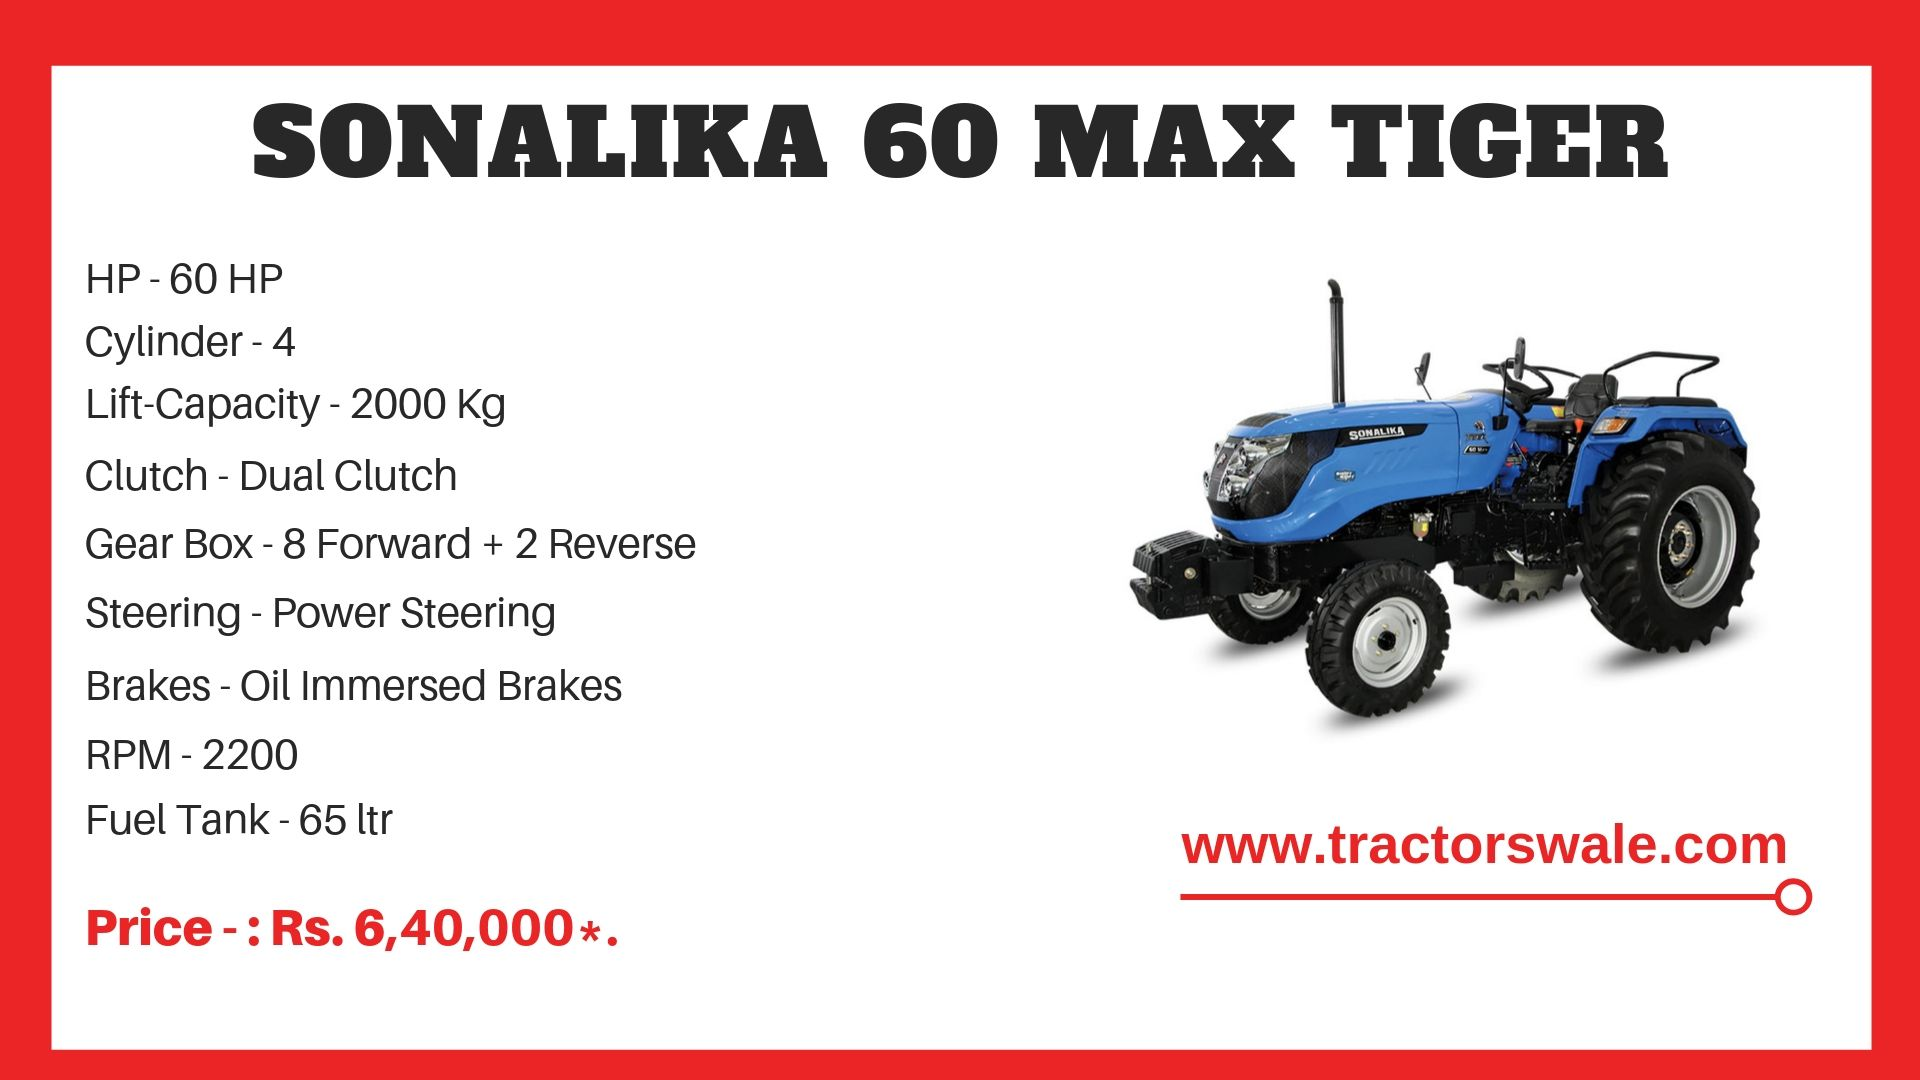 Sonalika 60 tractor specs